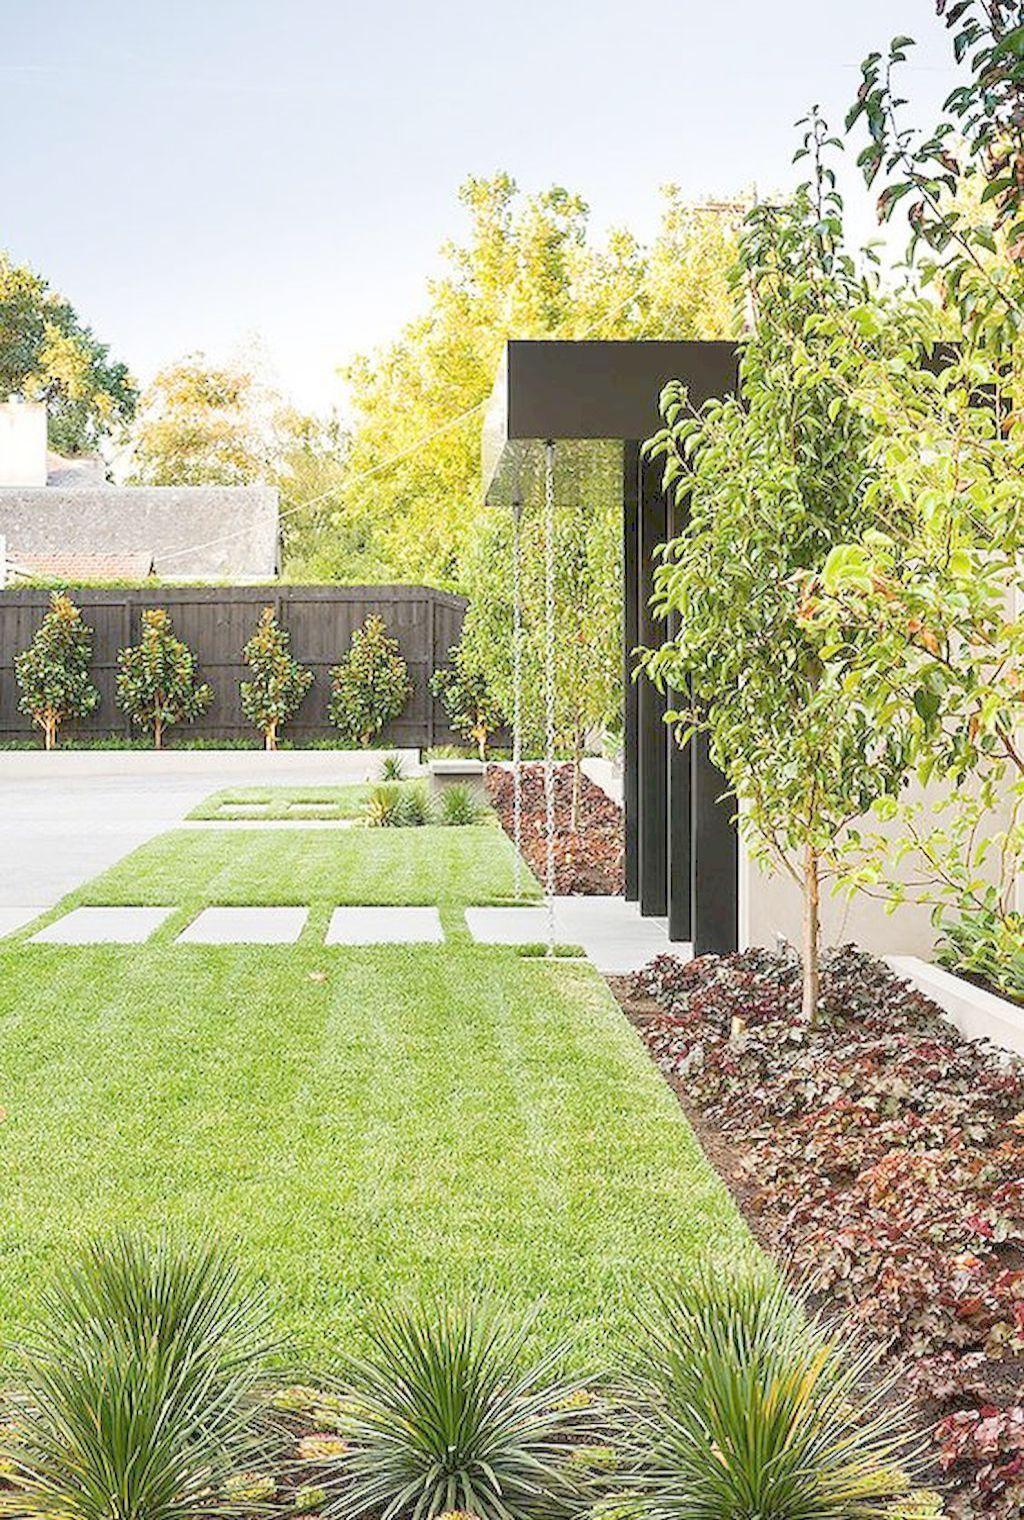 Landscape Gardening Jobs London Only Landscape Gardening Nottingham Below Contemporary Garden Lands Modern Landscape Design Modern Landscaping Landscape Design